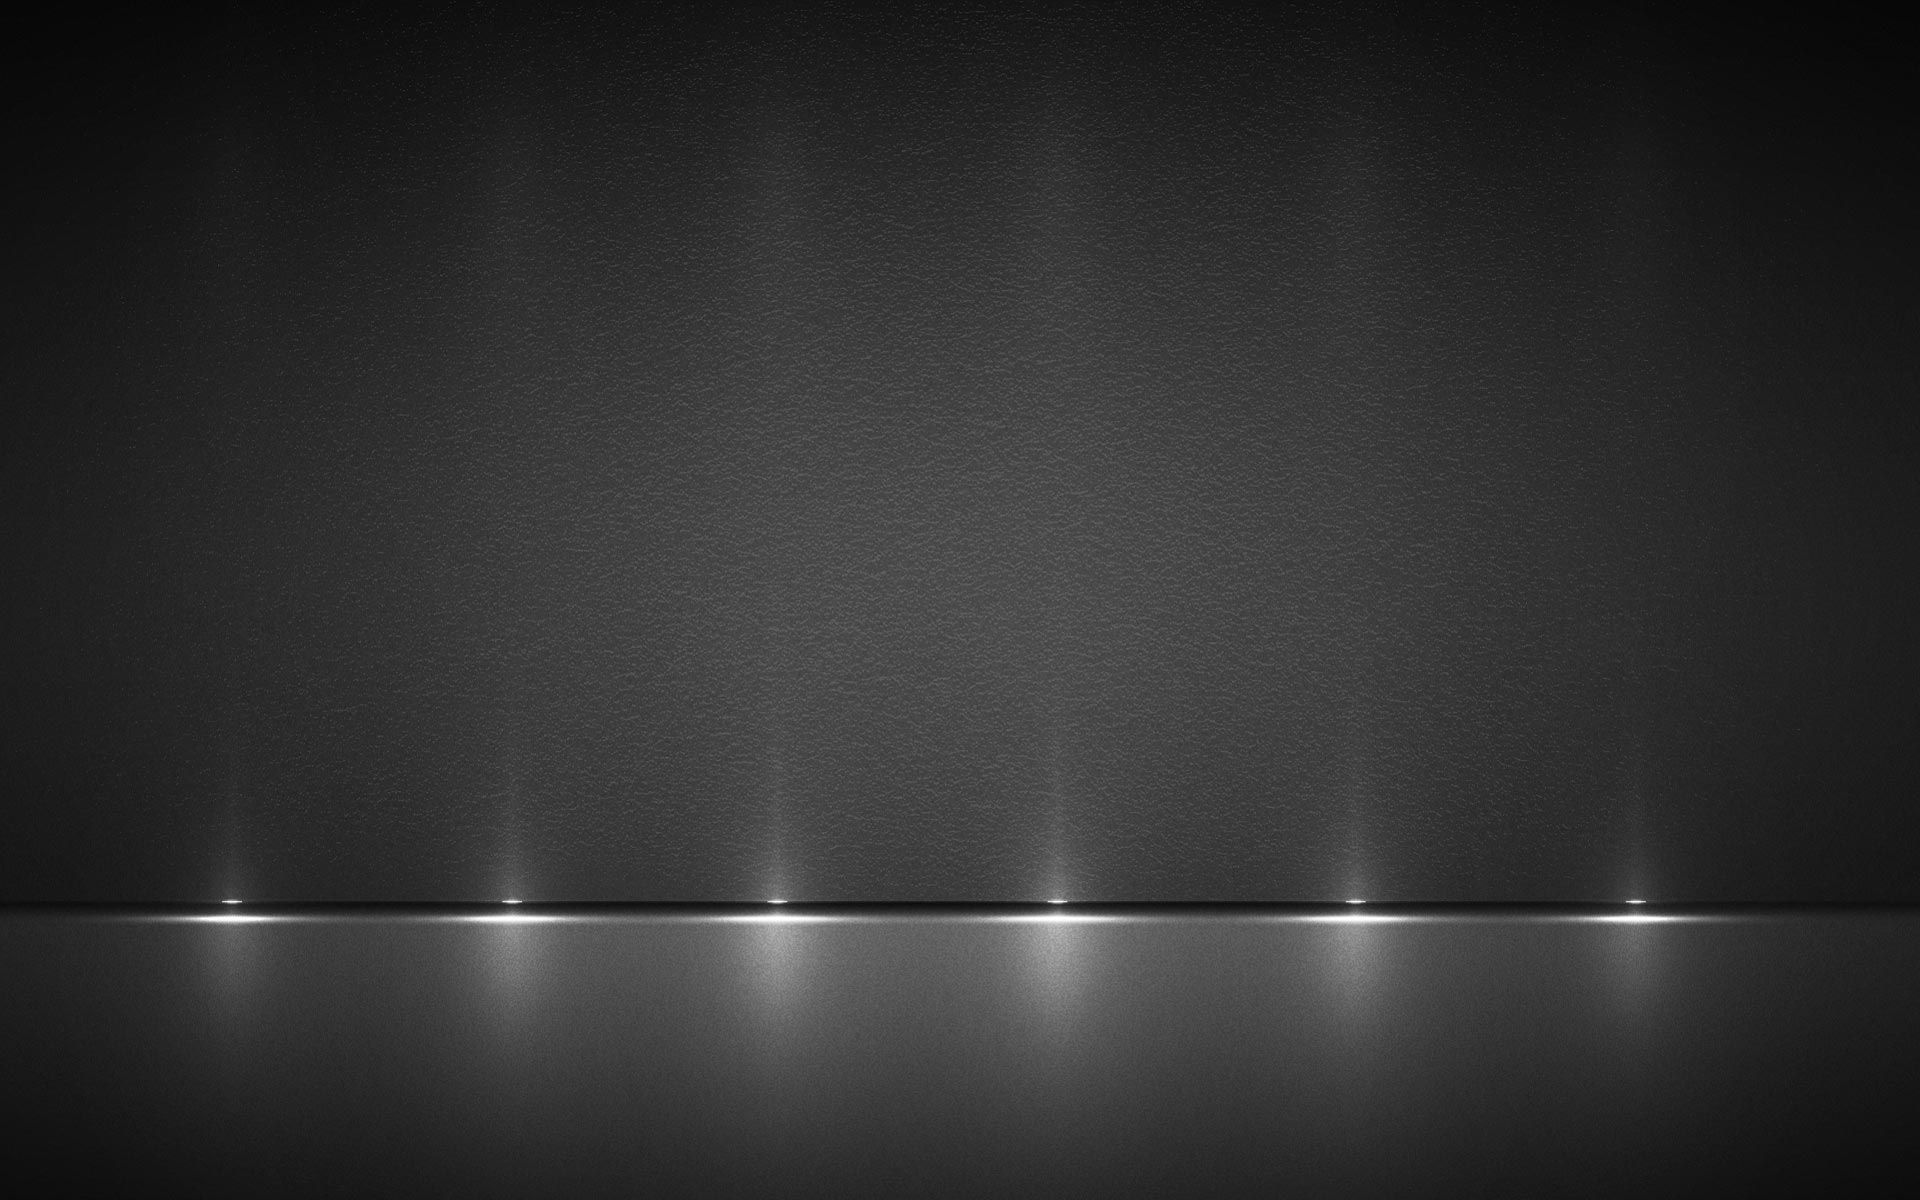 Desktop Wallpaper · Gallery · Computers LED lights Grey